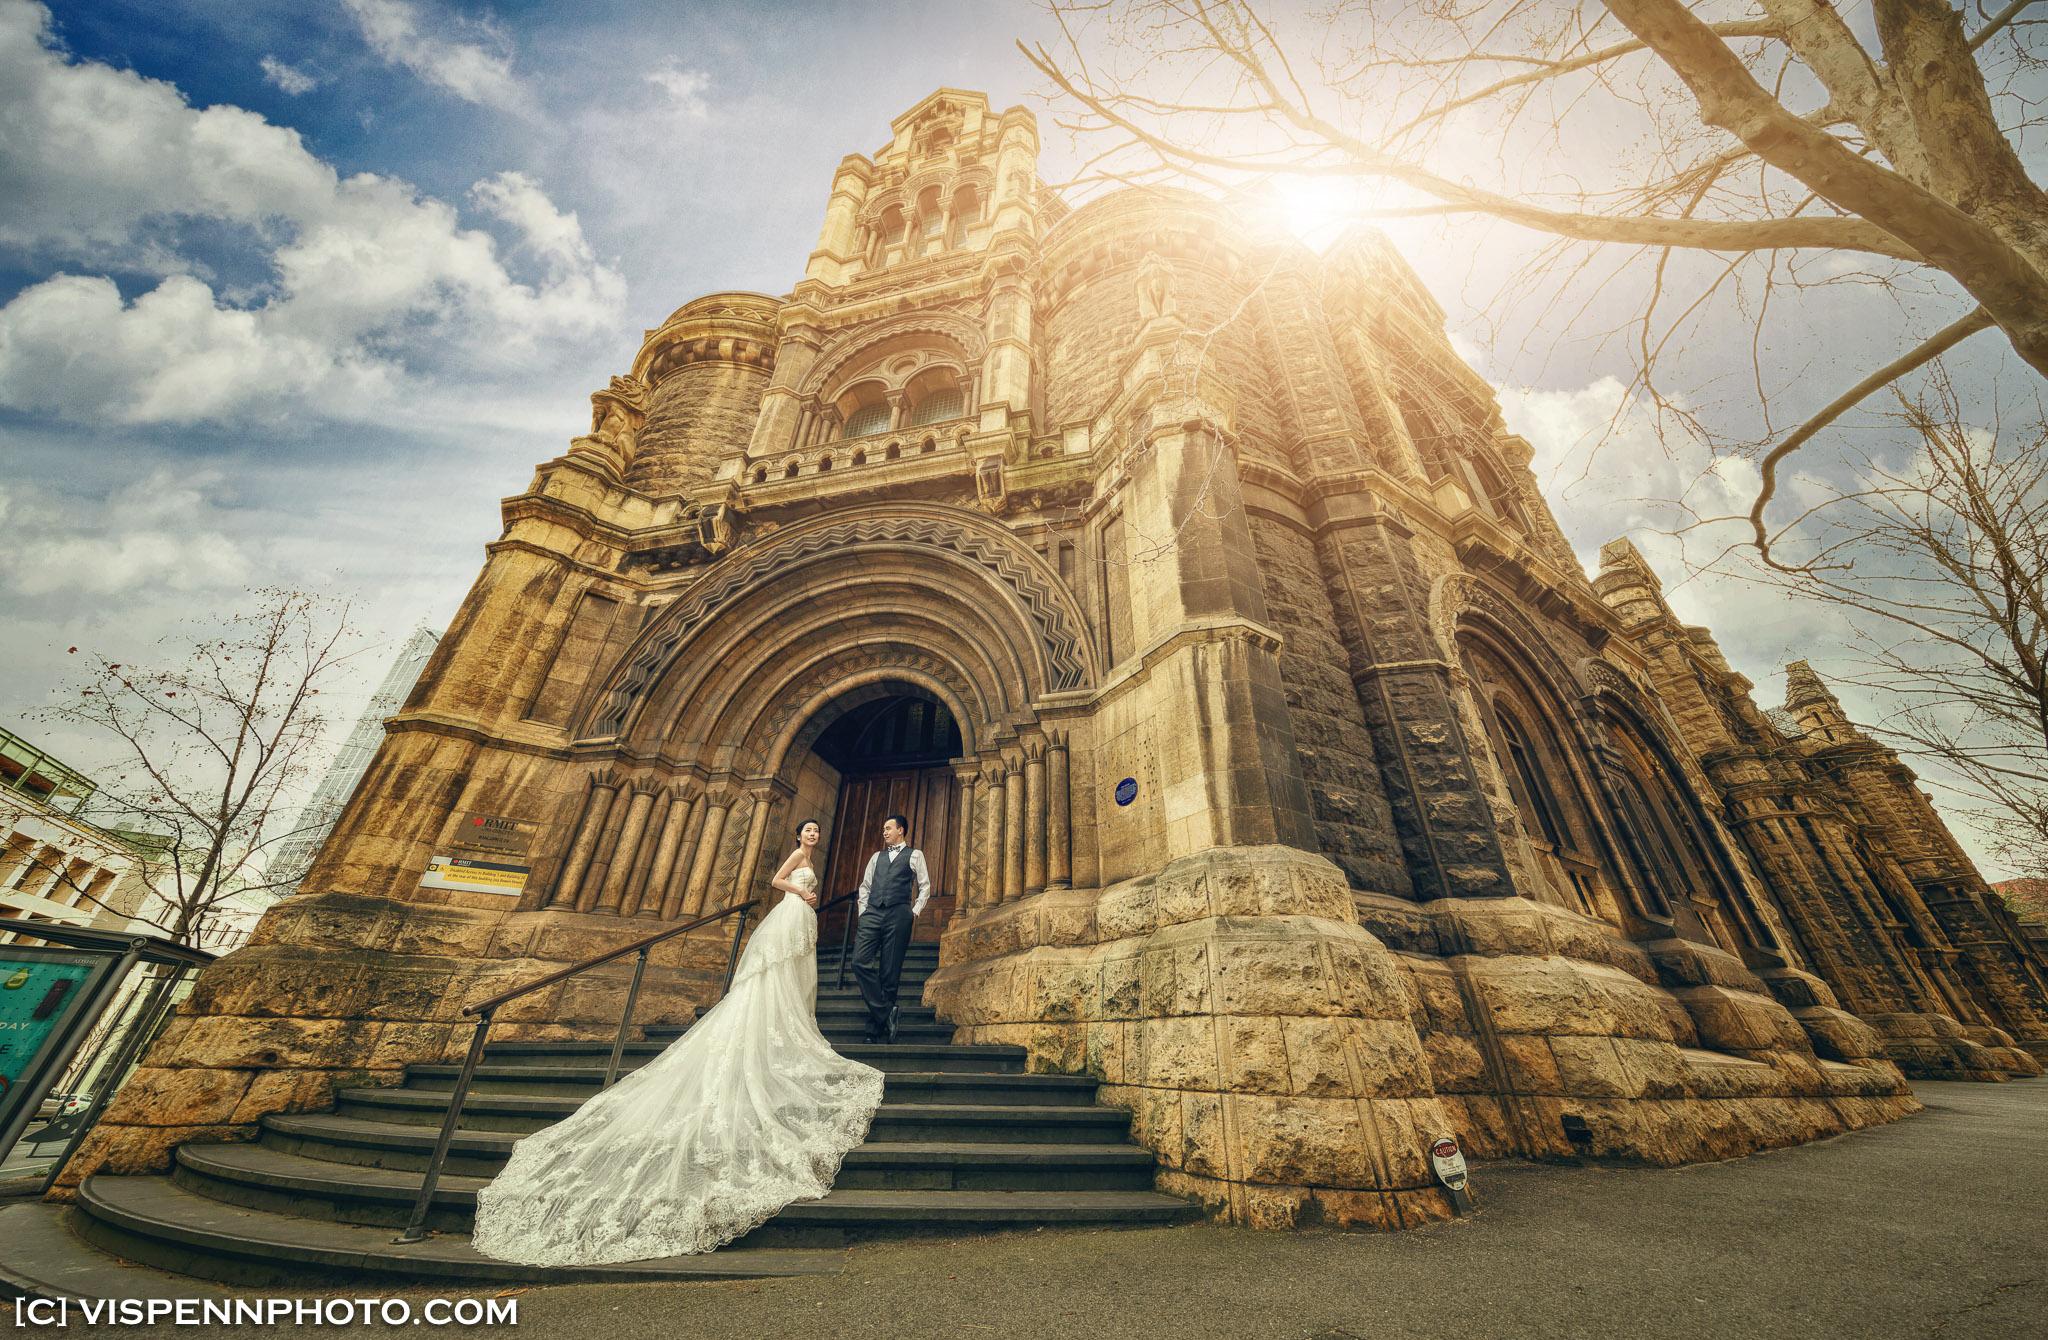 PRE WEDDING Photography Melbourne ZHPENN XXD 3520 1